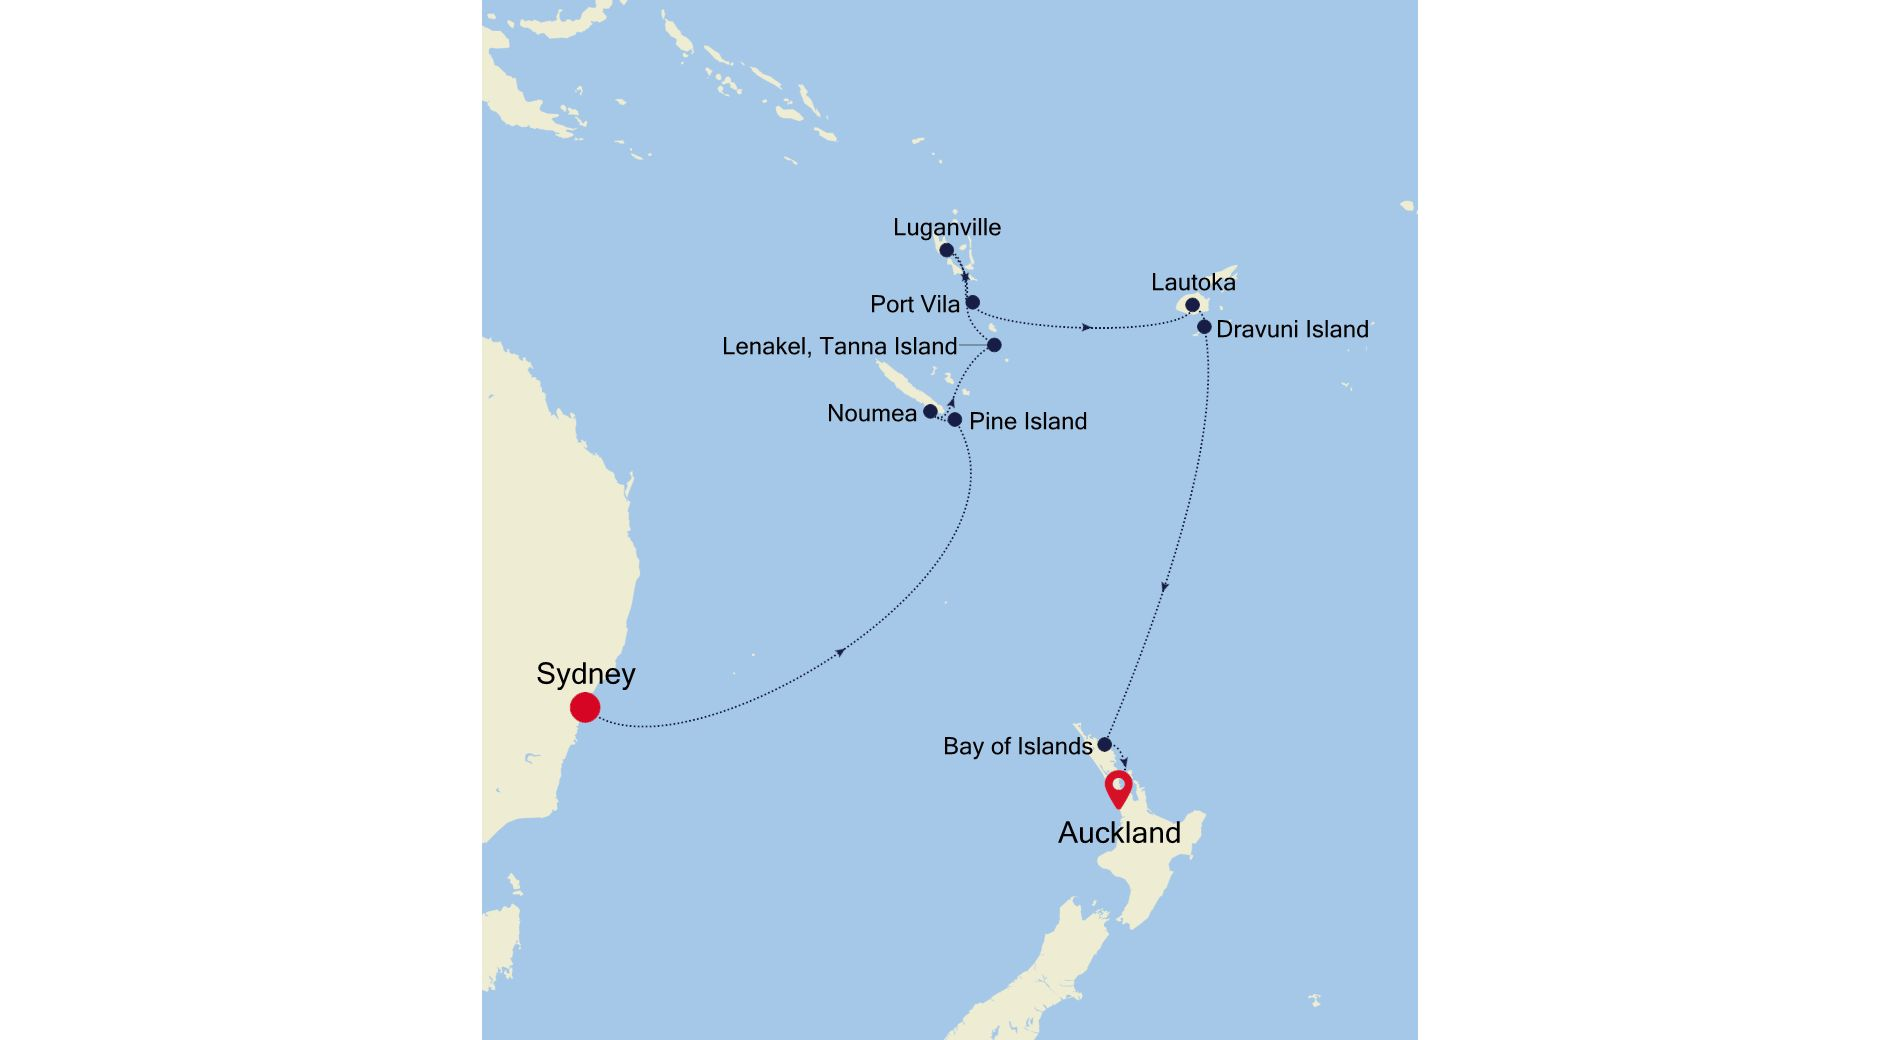 SM210119014 - Sydney nach Auckland